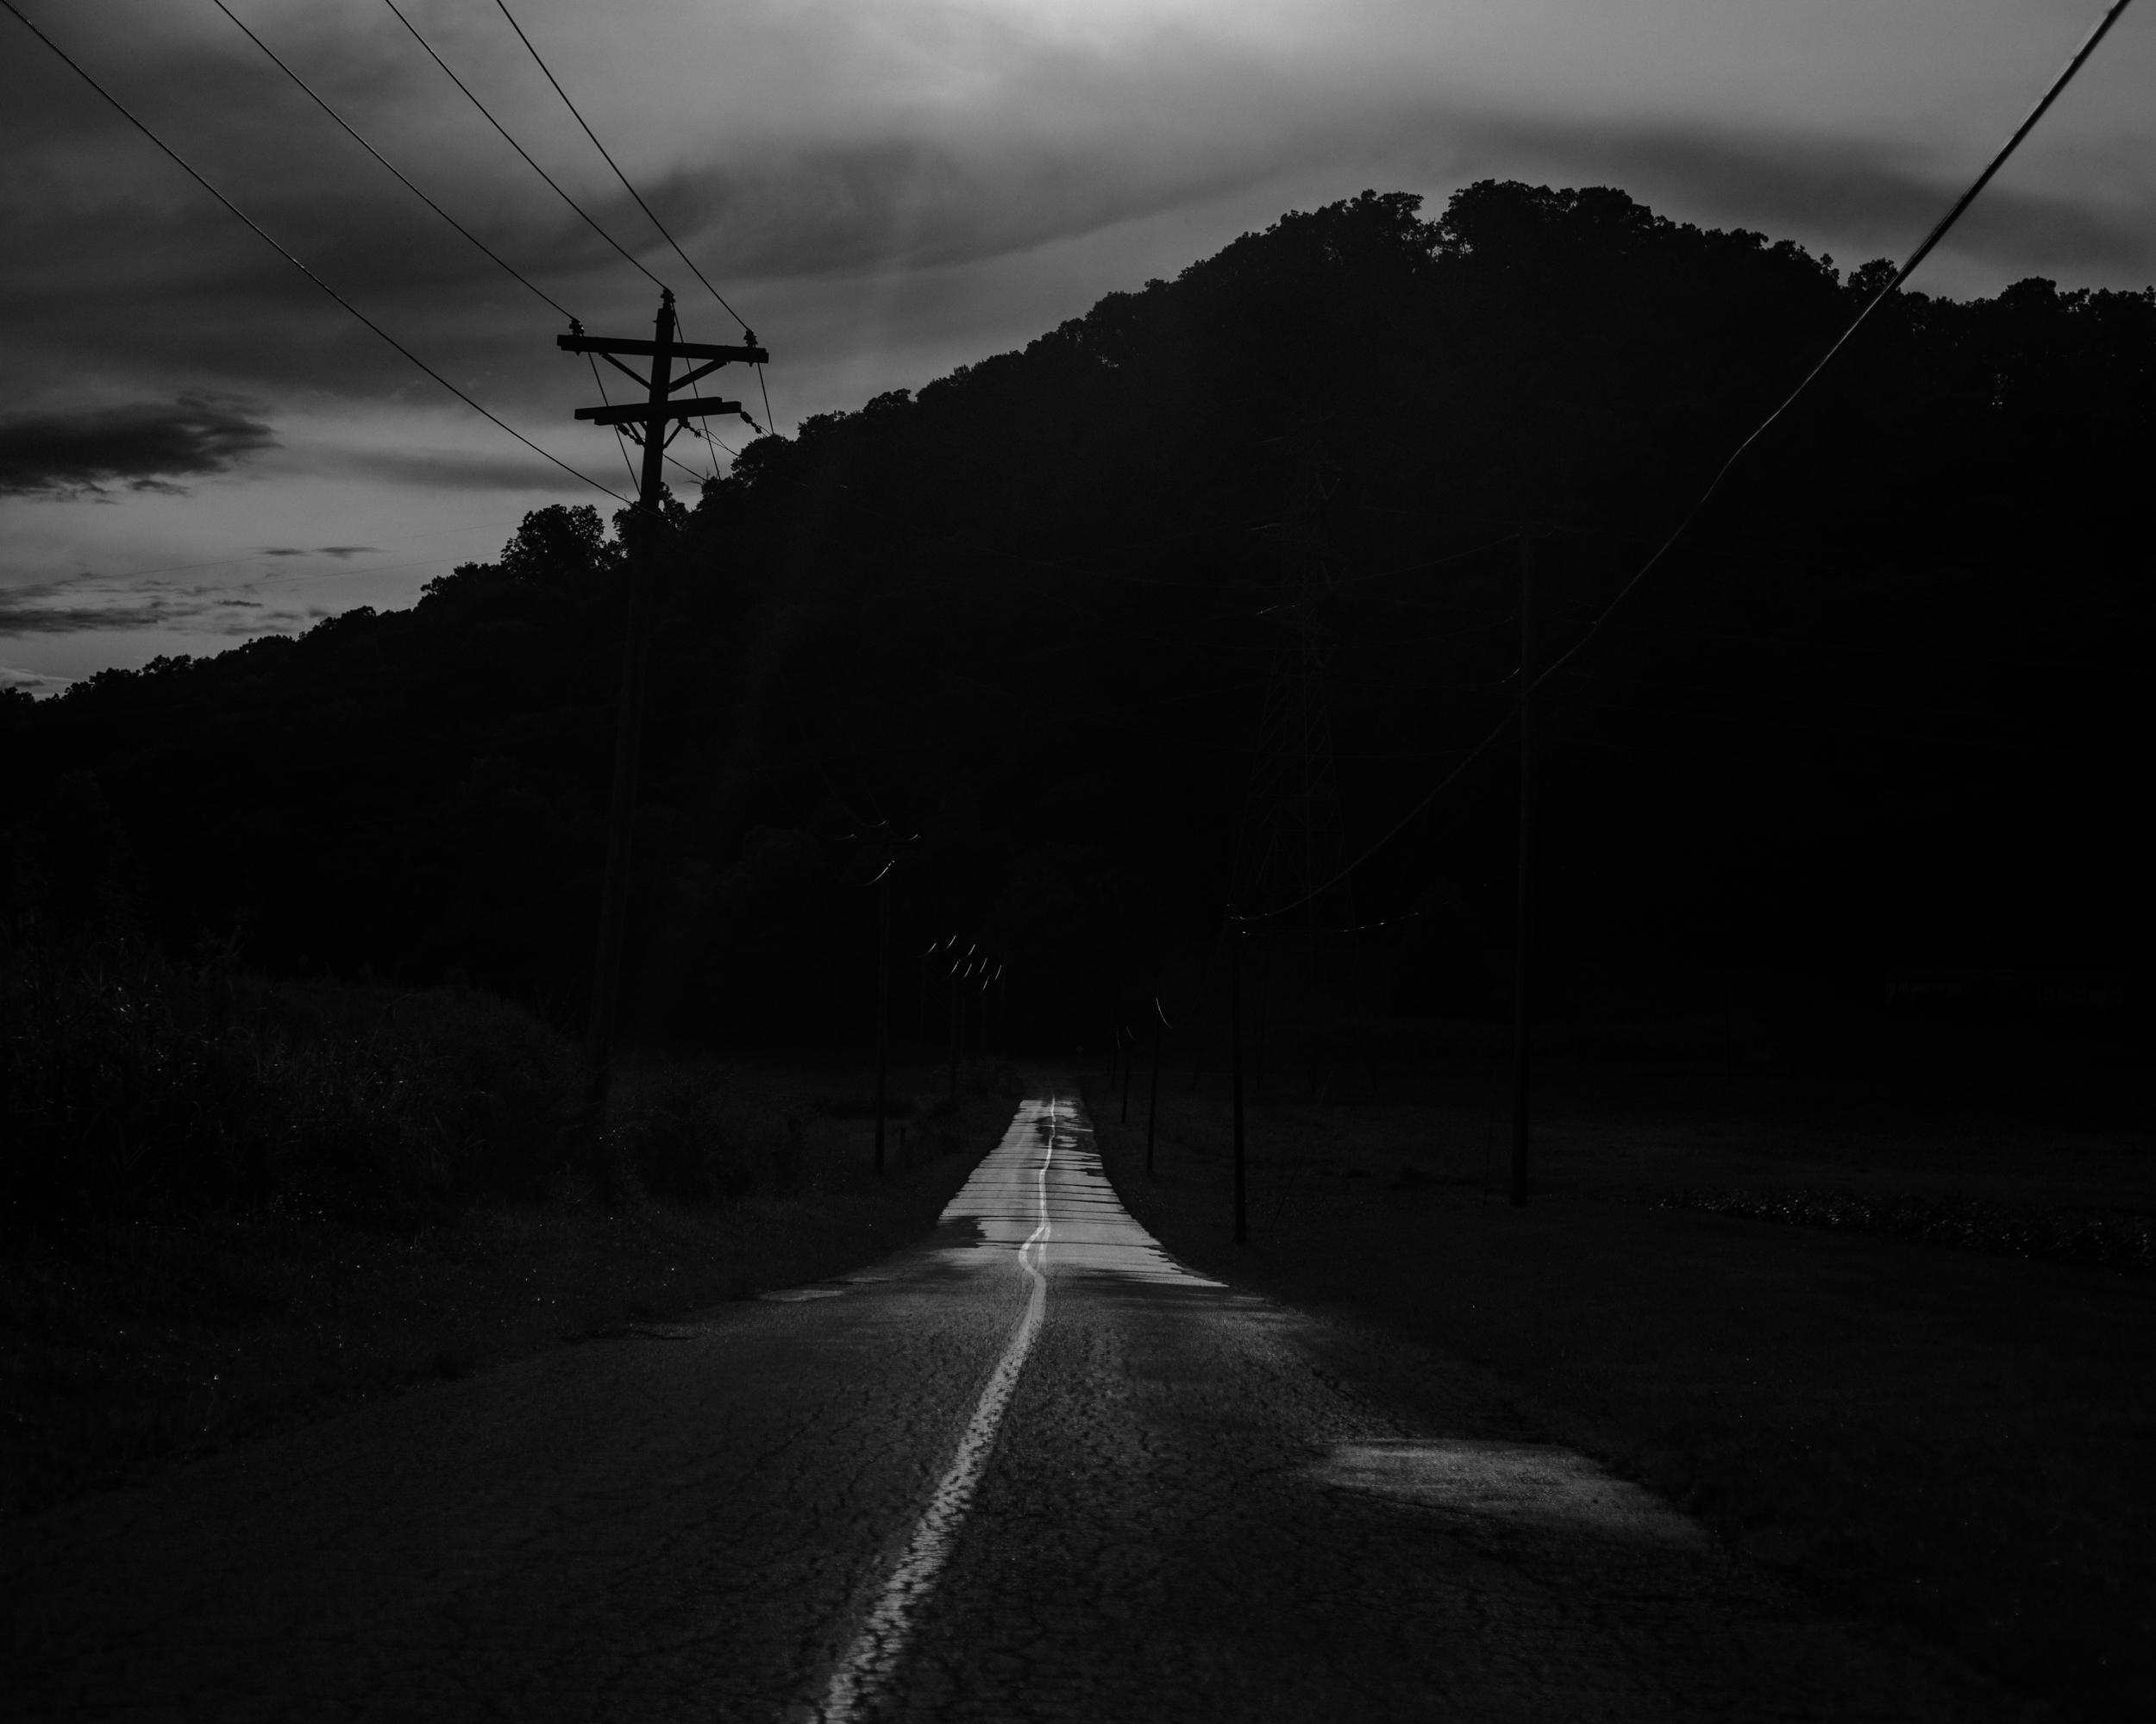 Road-Indiana-Web-1.jpg